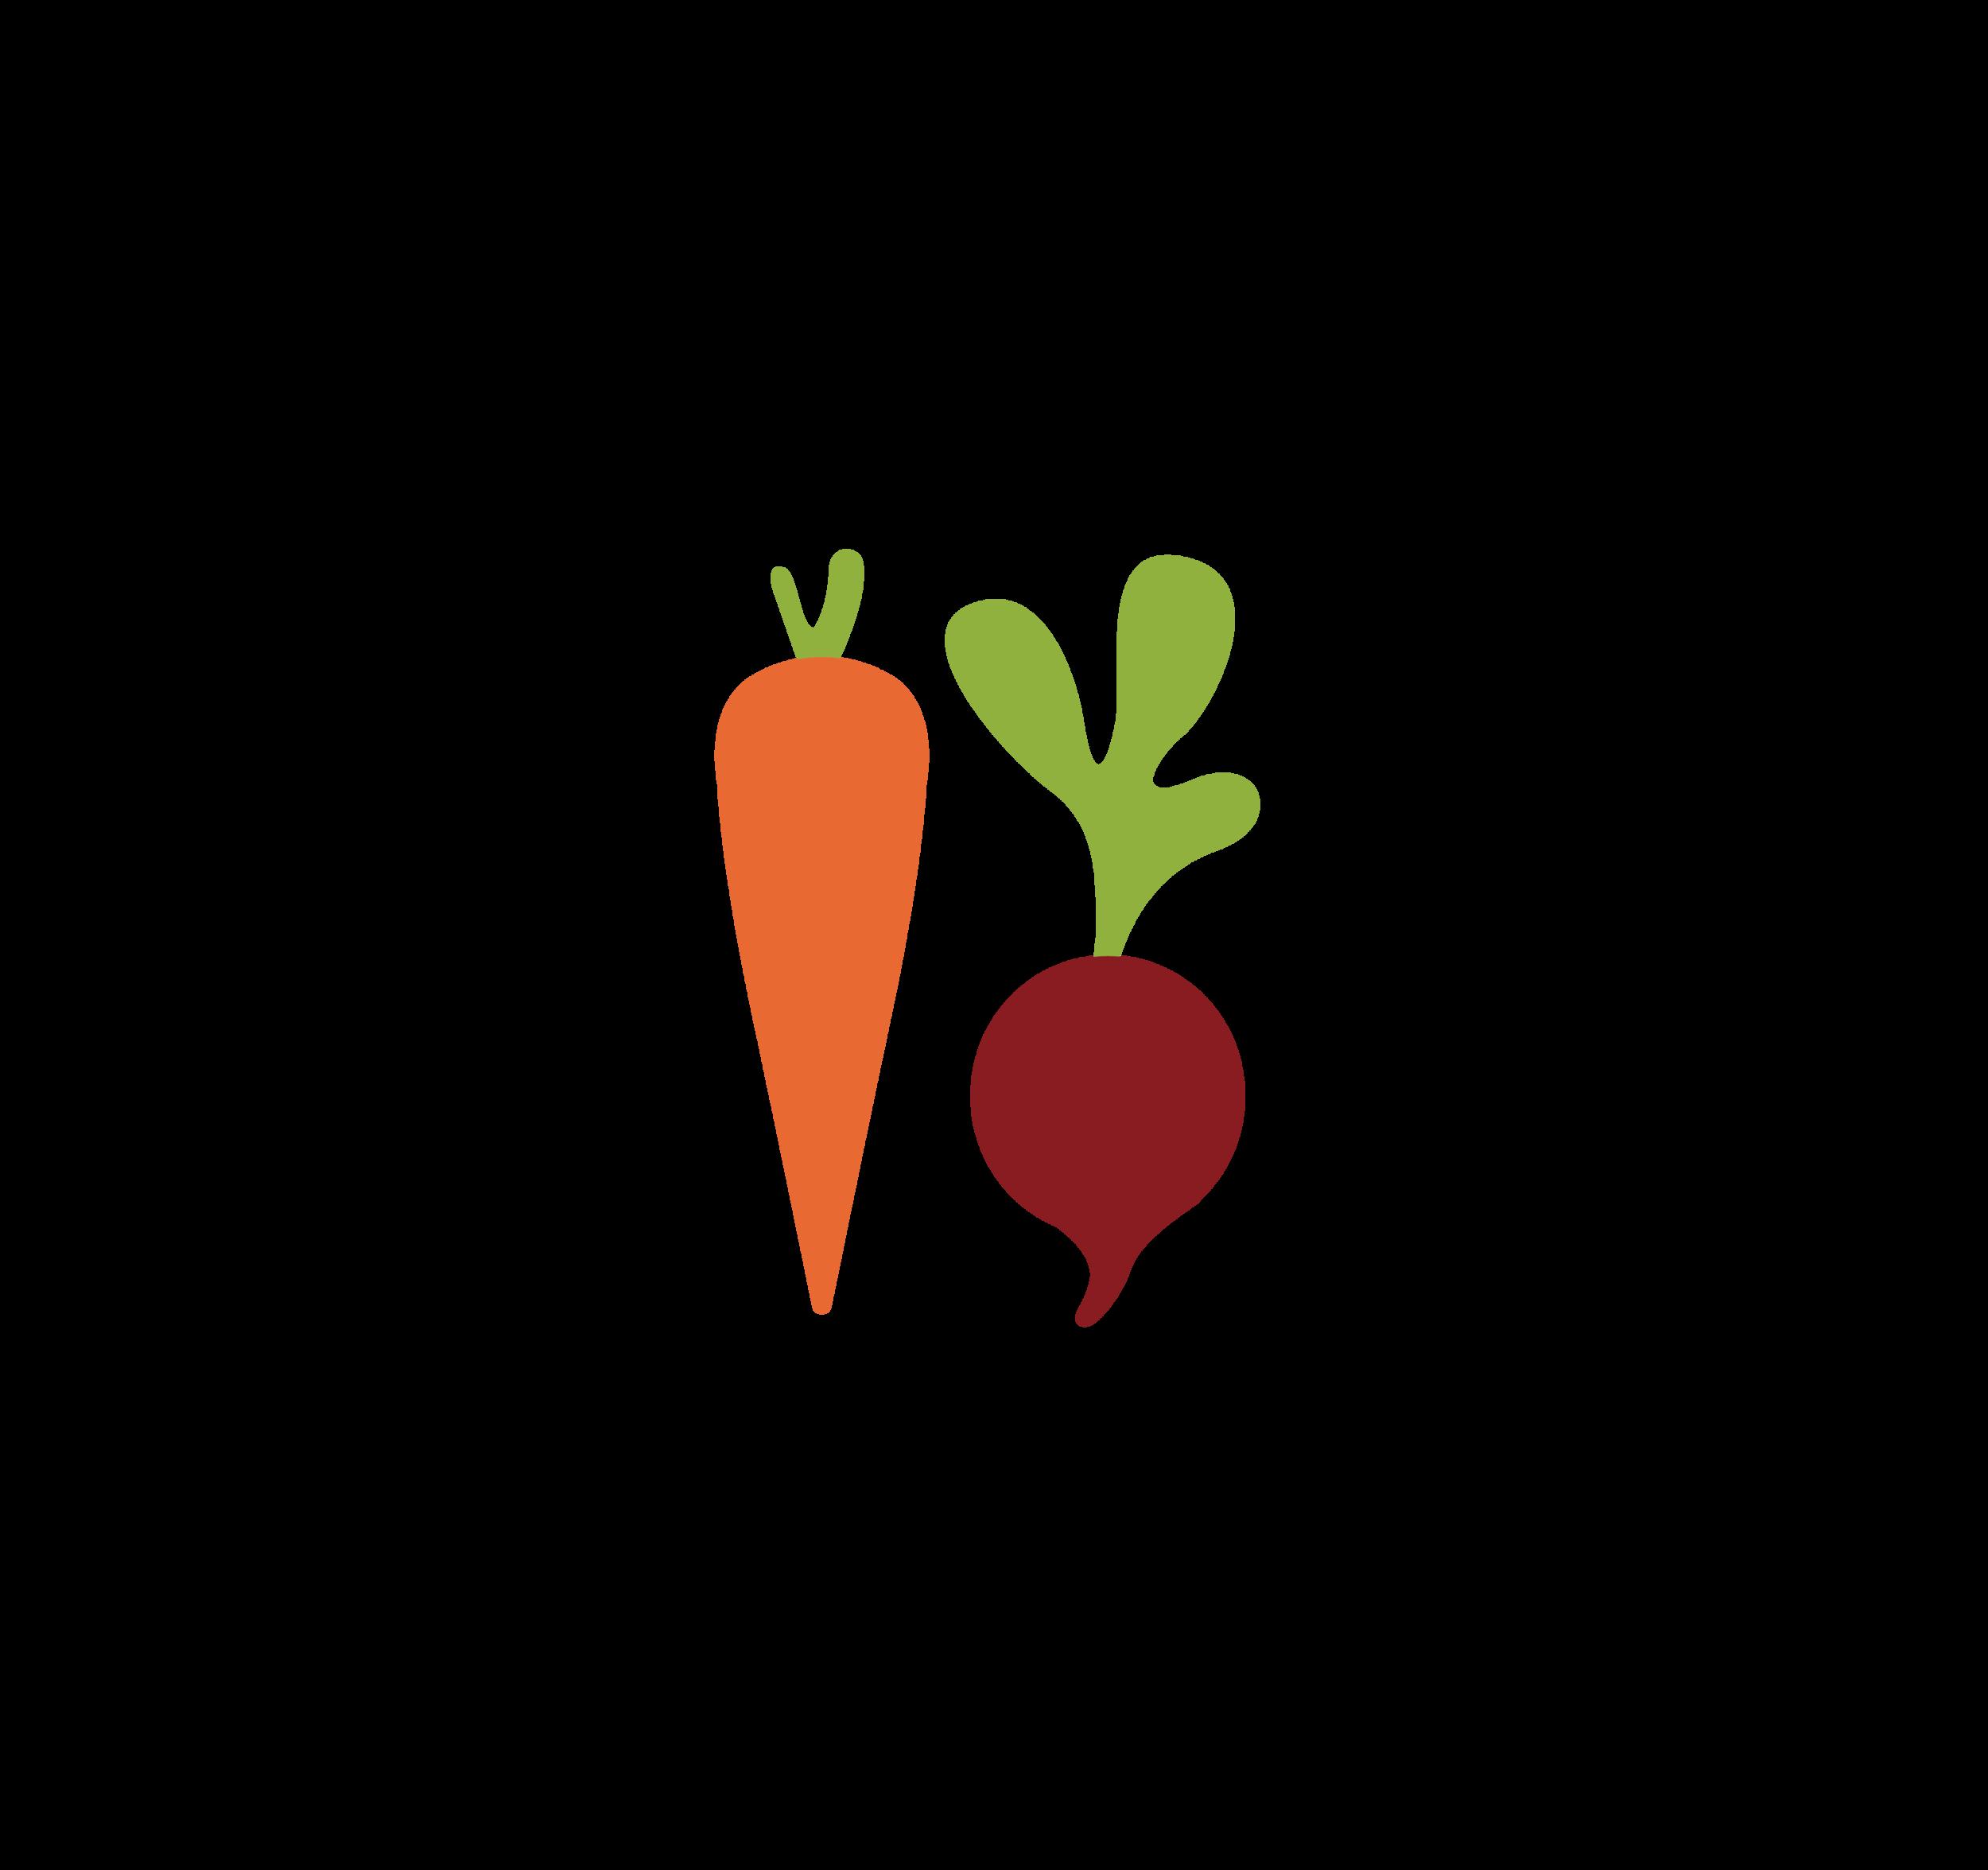 Logo_Full_Color-02.png